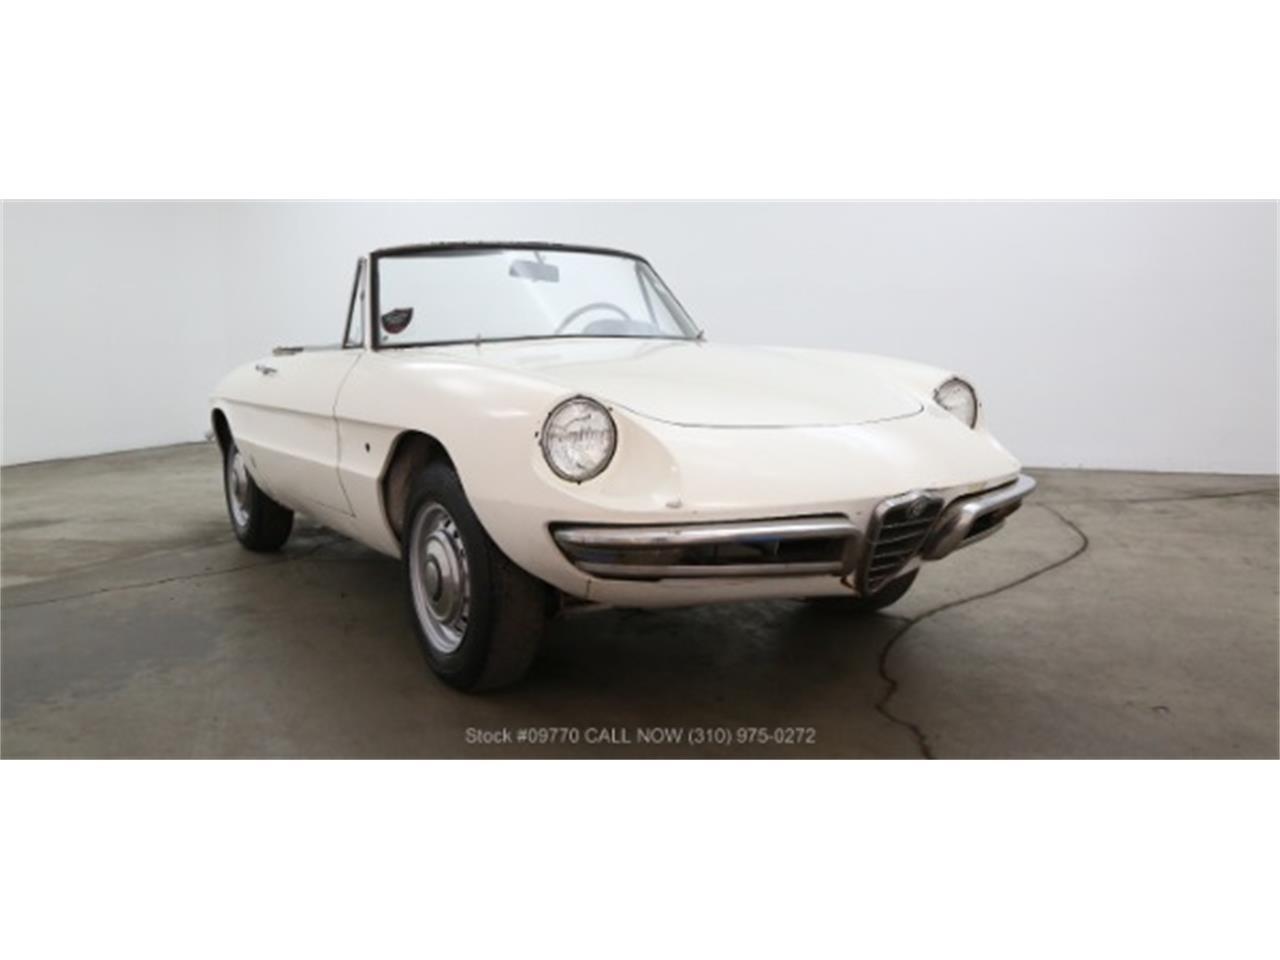 Alfa Romeo Spider For Sale ClassicCarscom CC - 1967 alfa romeo spider for sale